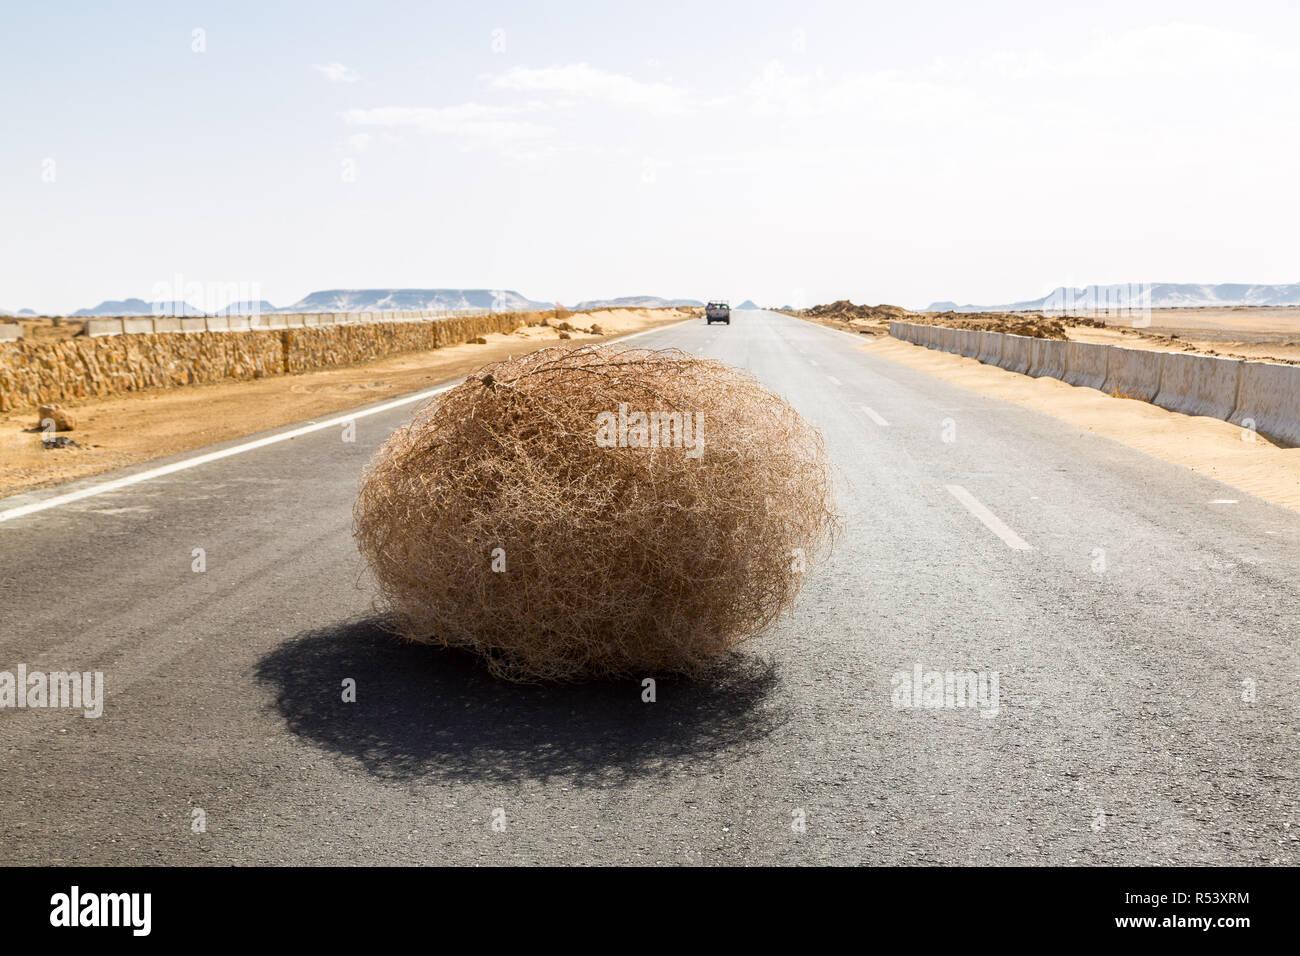 Giant tumbleweed on the highway with sandy dunes, between el-Bahariya oasis and Al Farafra oasis, Western Desert of Egypt. Sahara. - Stock Image